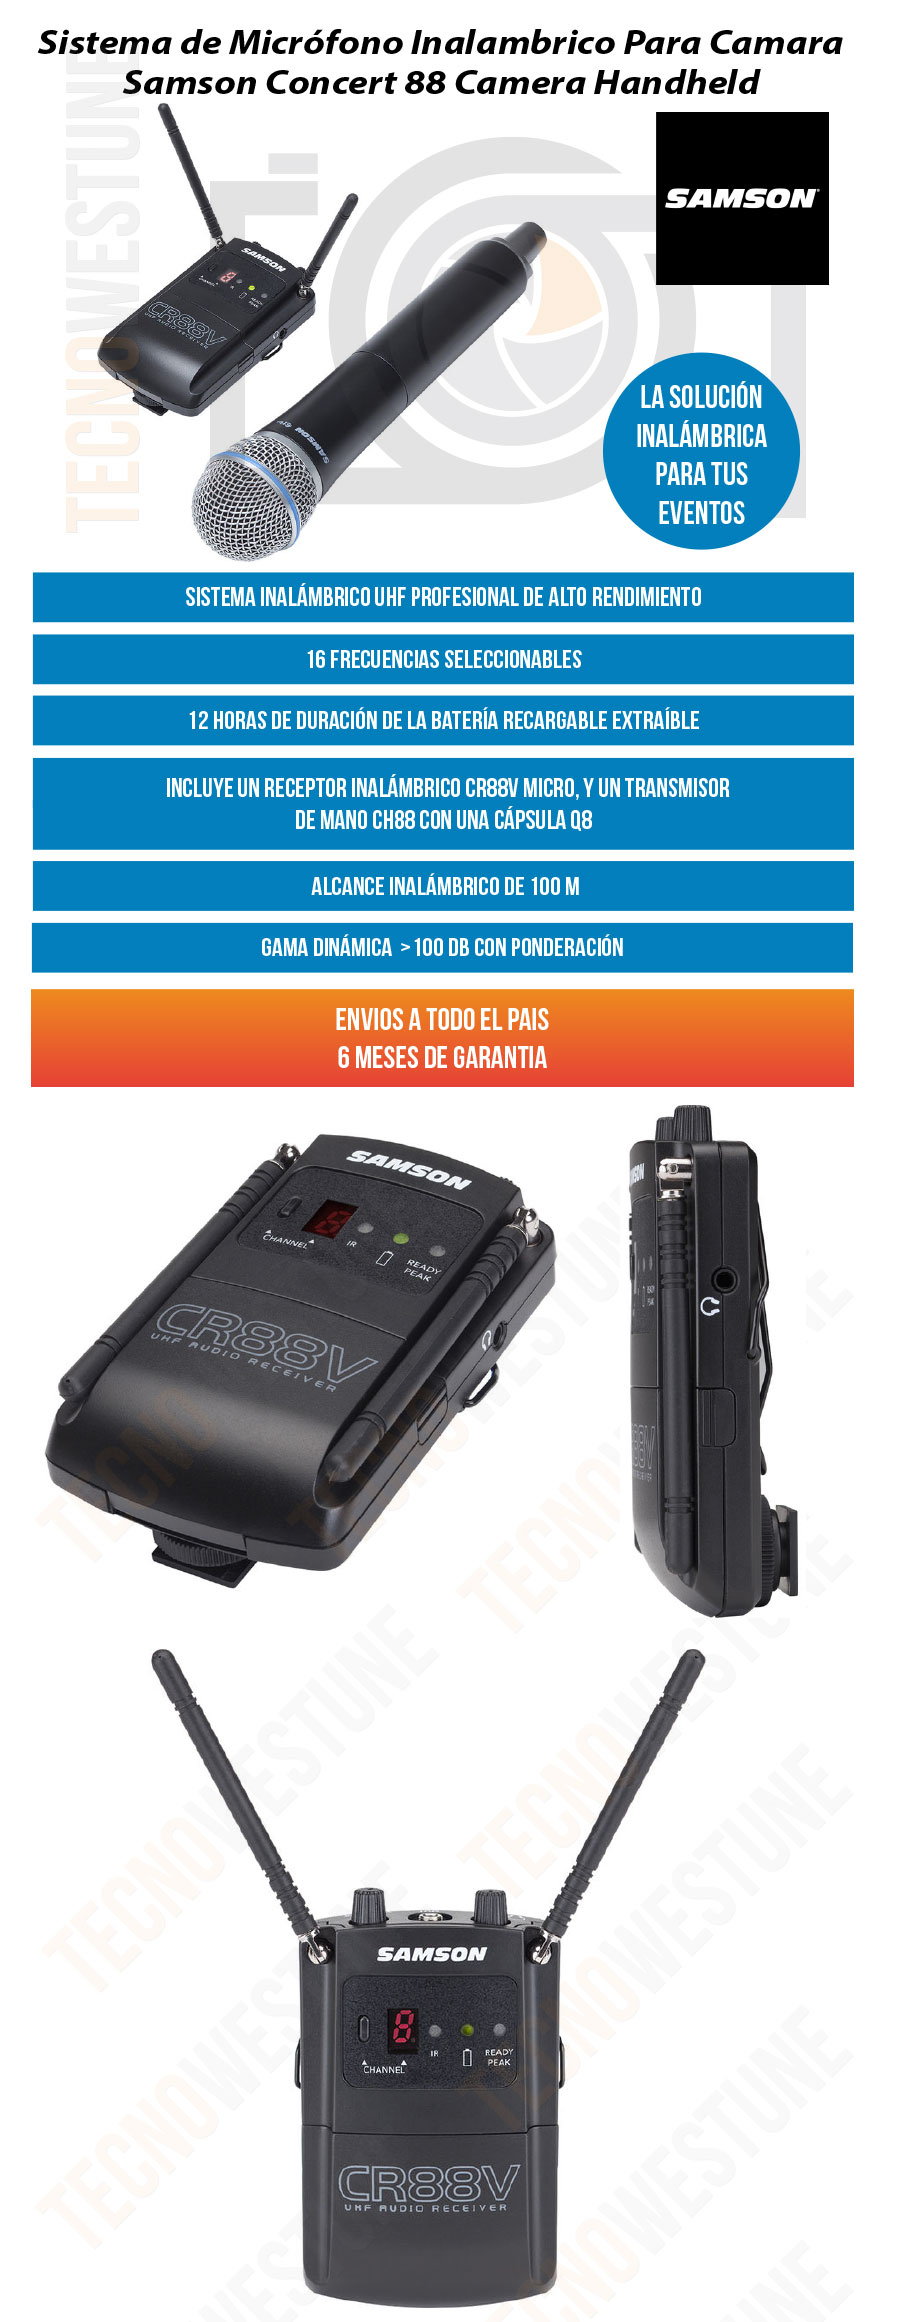 Samson-Concert-88-Camera-Handheld